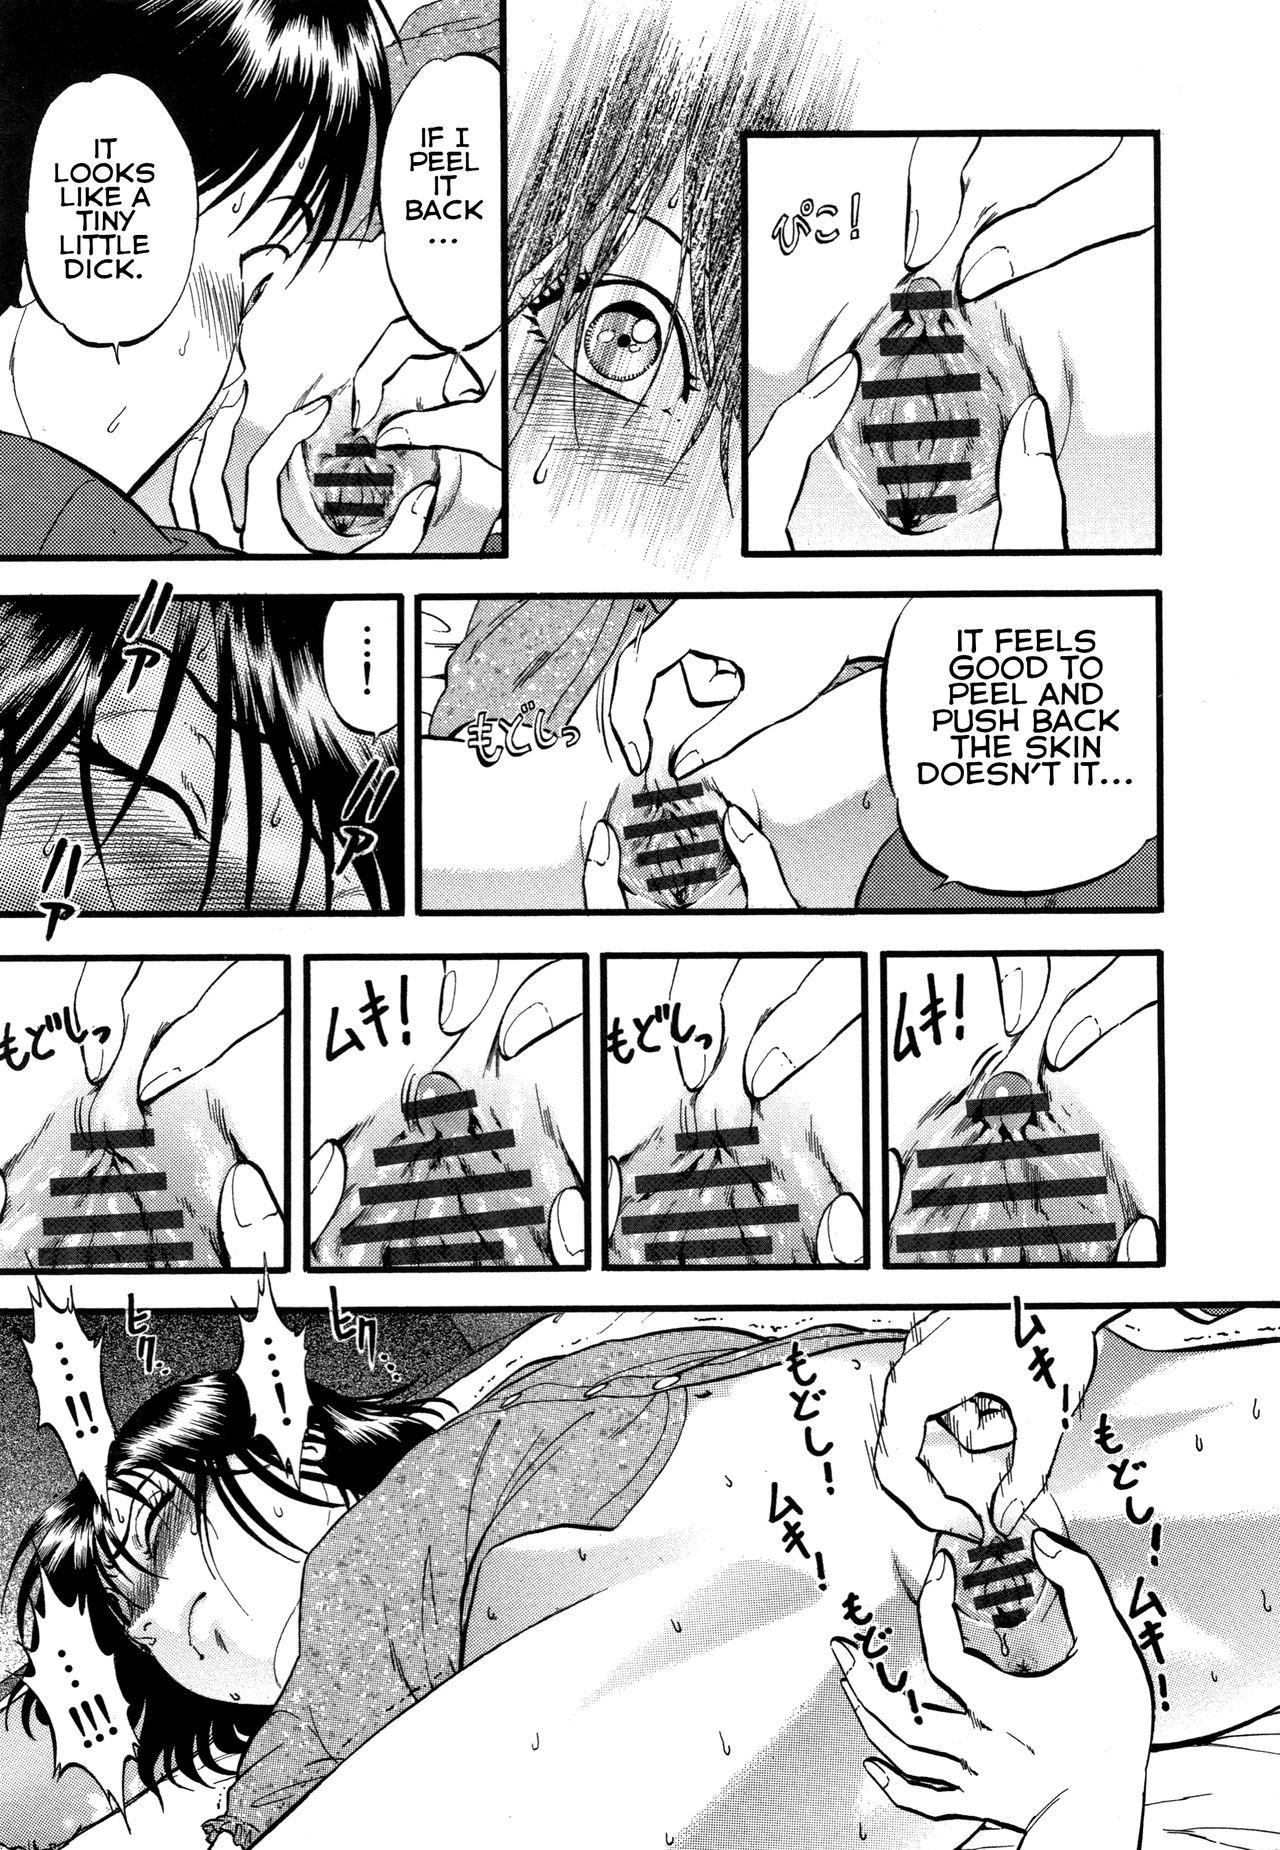 [RPG Company 2 (Yoriu Mushi)] R-Shitei Play 1 - Little Night Crawling [English] 15